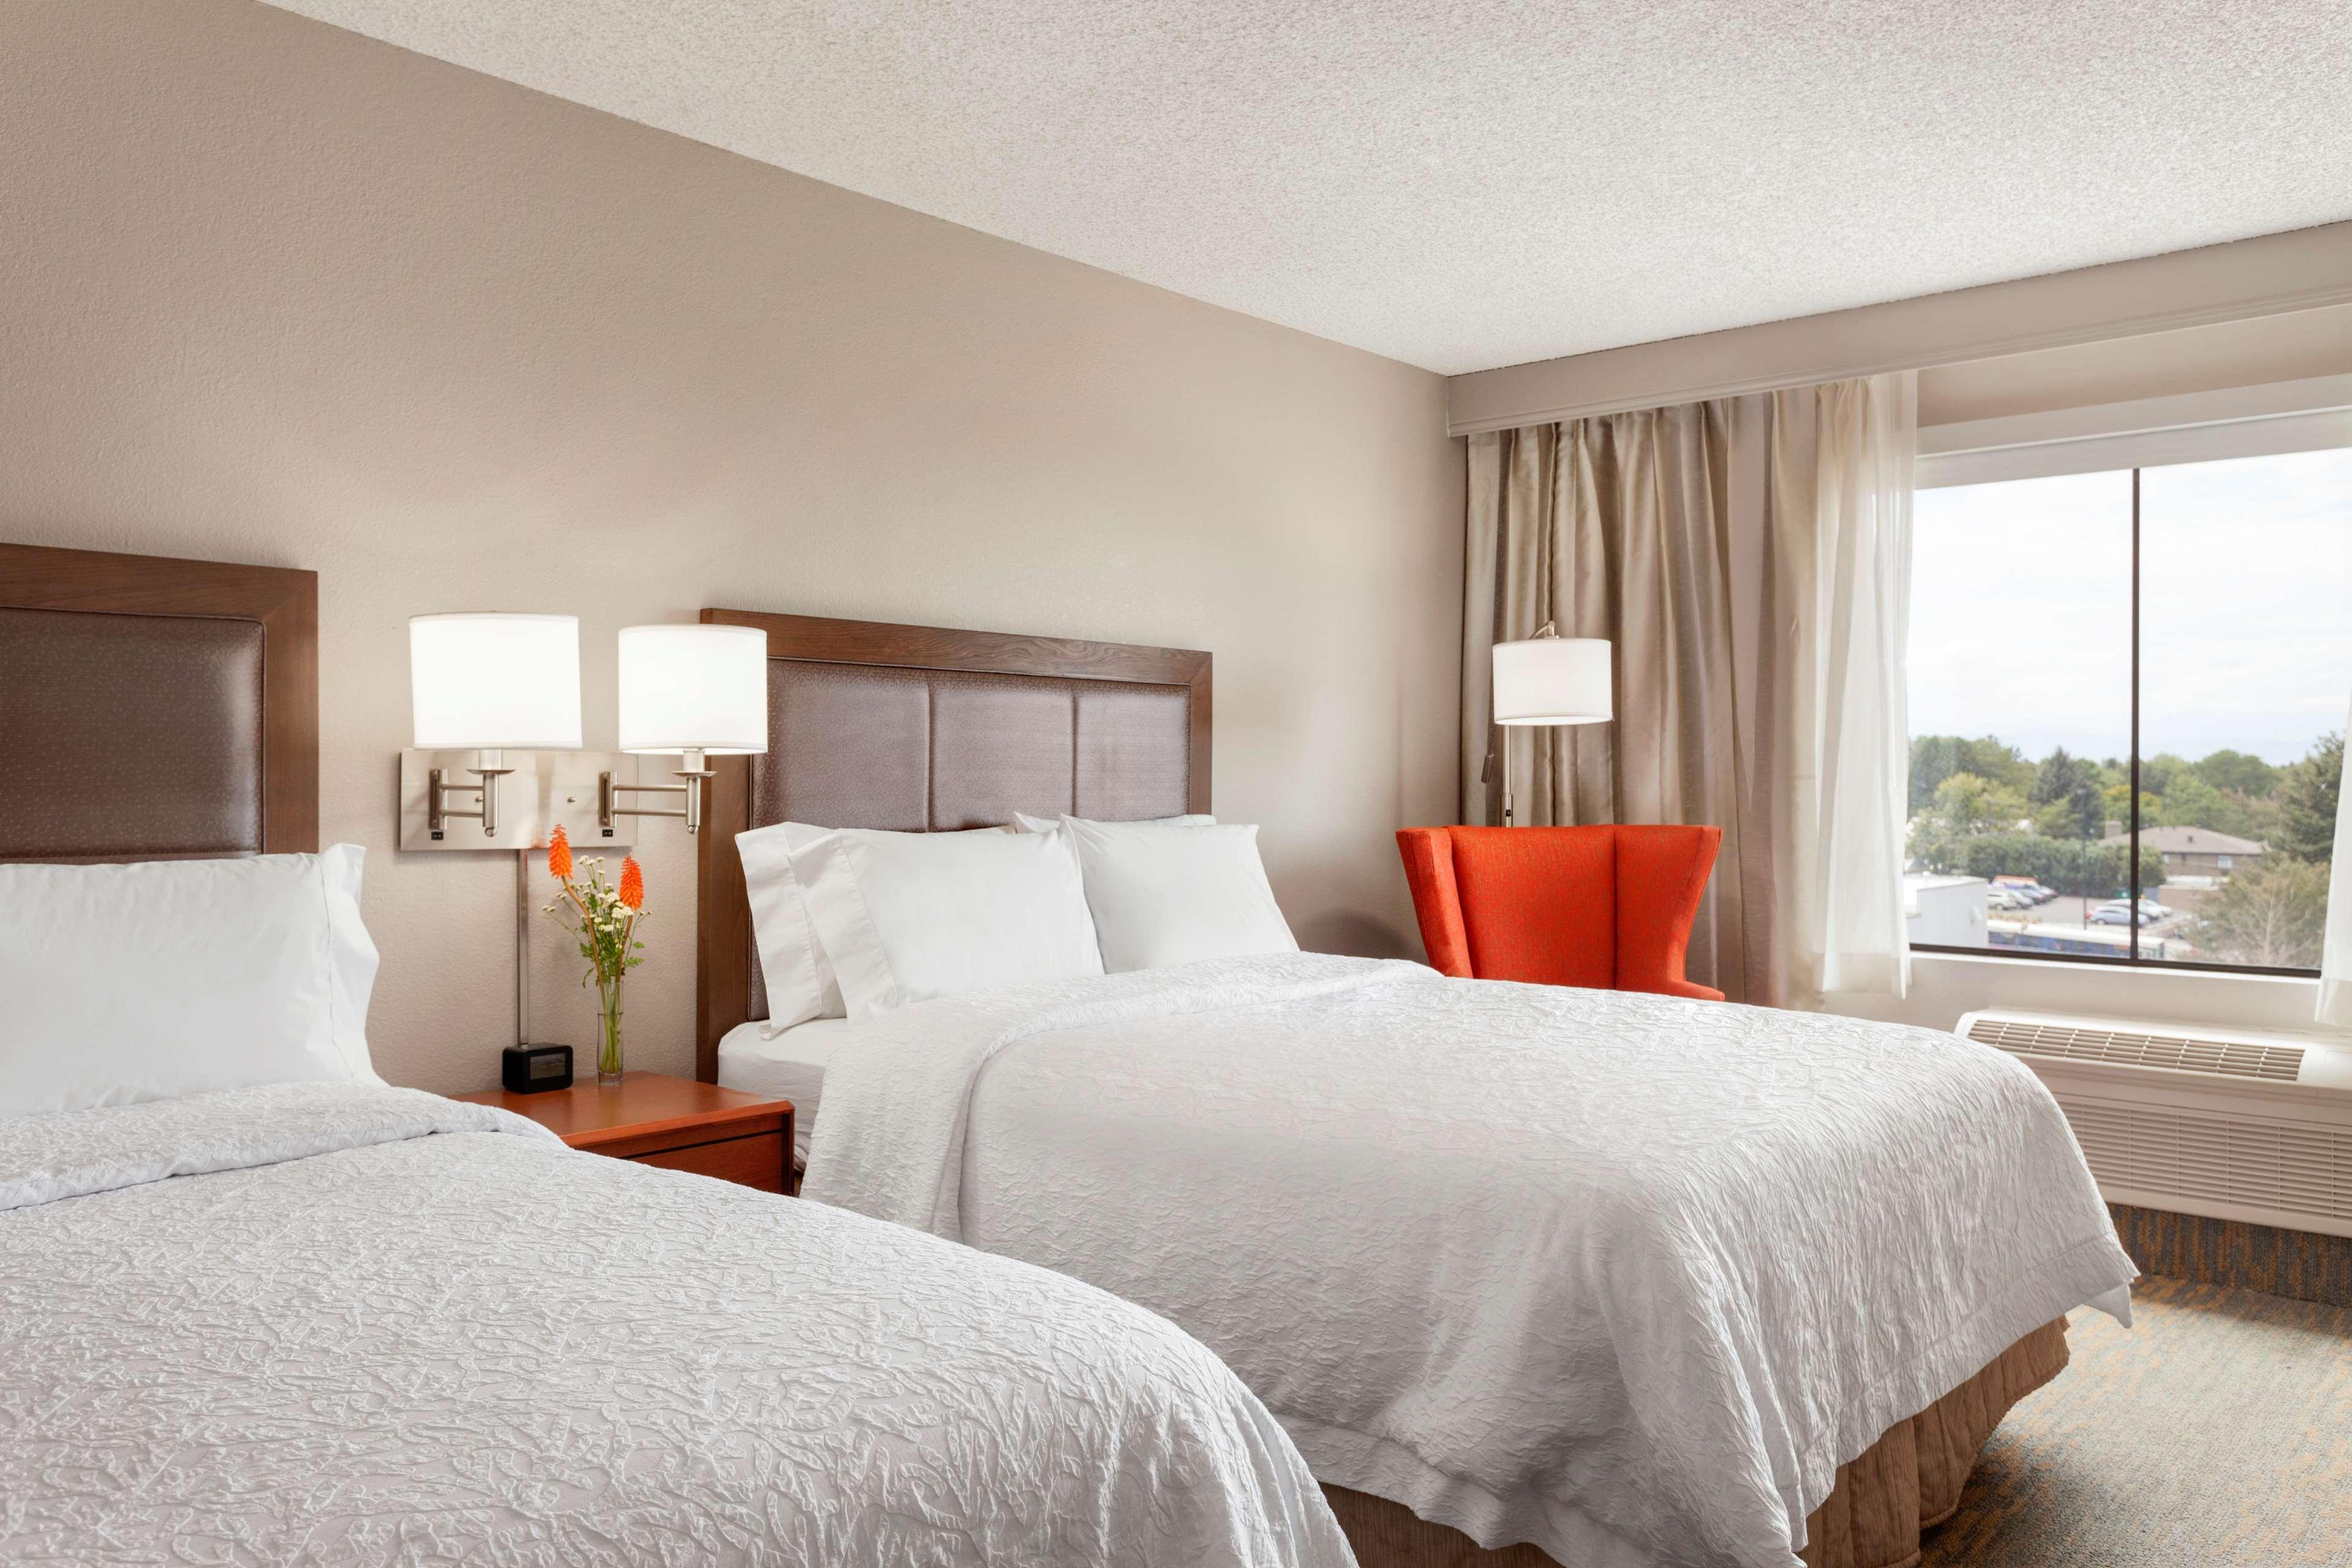 Hampton Inn & Suites Denver-Cherry Creek image 12